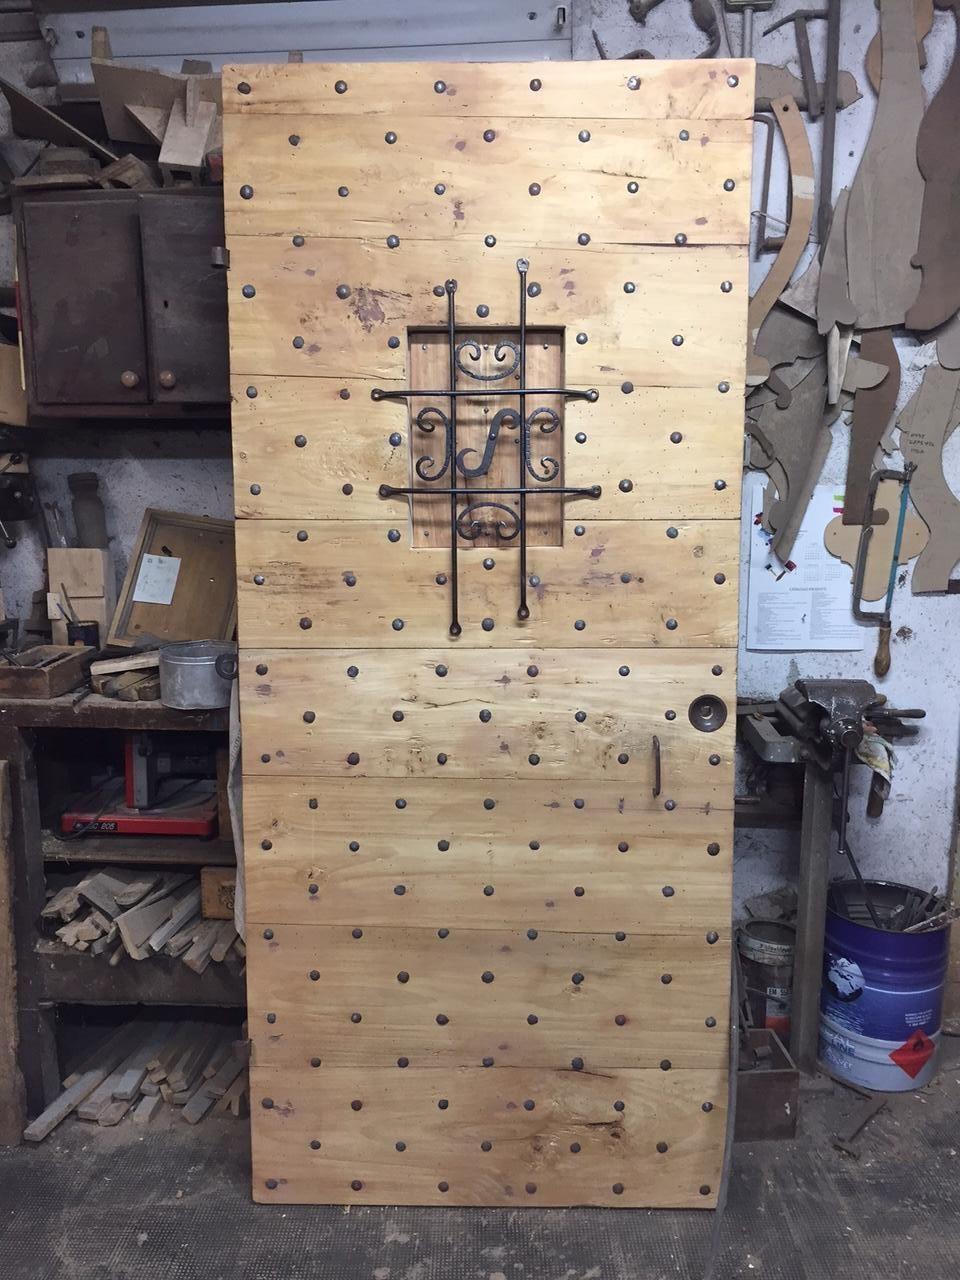 porta antica chiodata rustica riproduzione su misura antiques door portone legno | JPEGbay.com & porta antica chiodata rustica riproduzione su misura antiques door ...